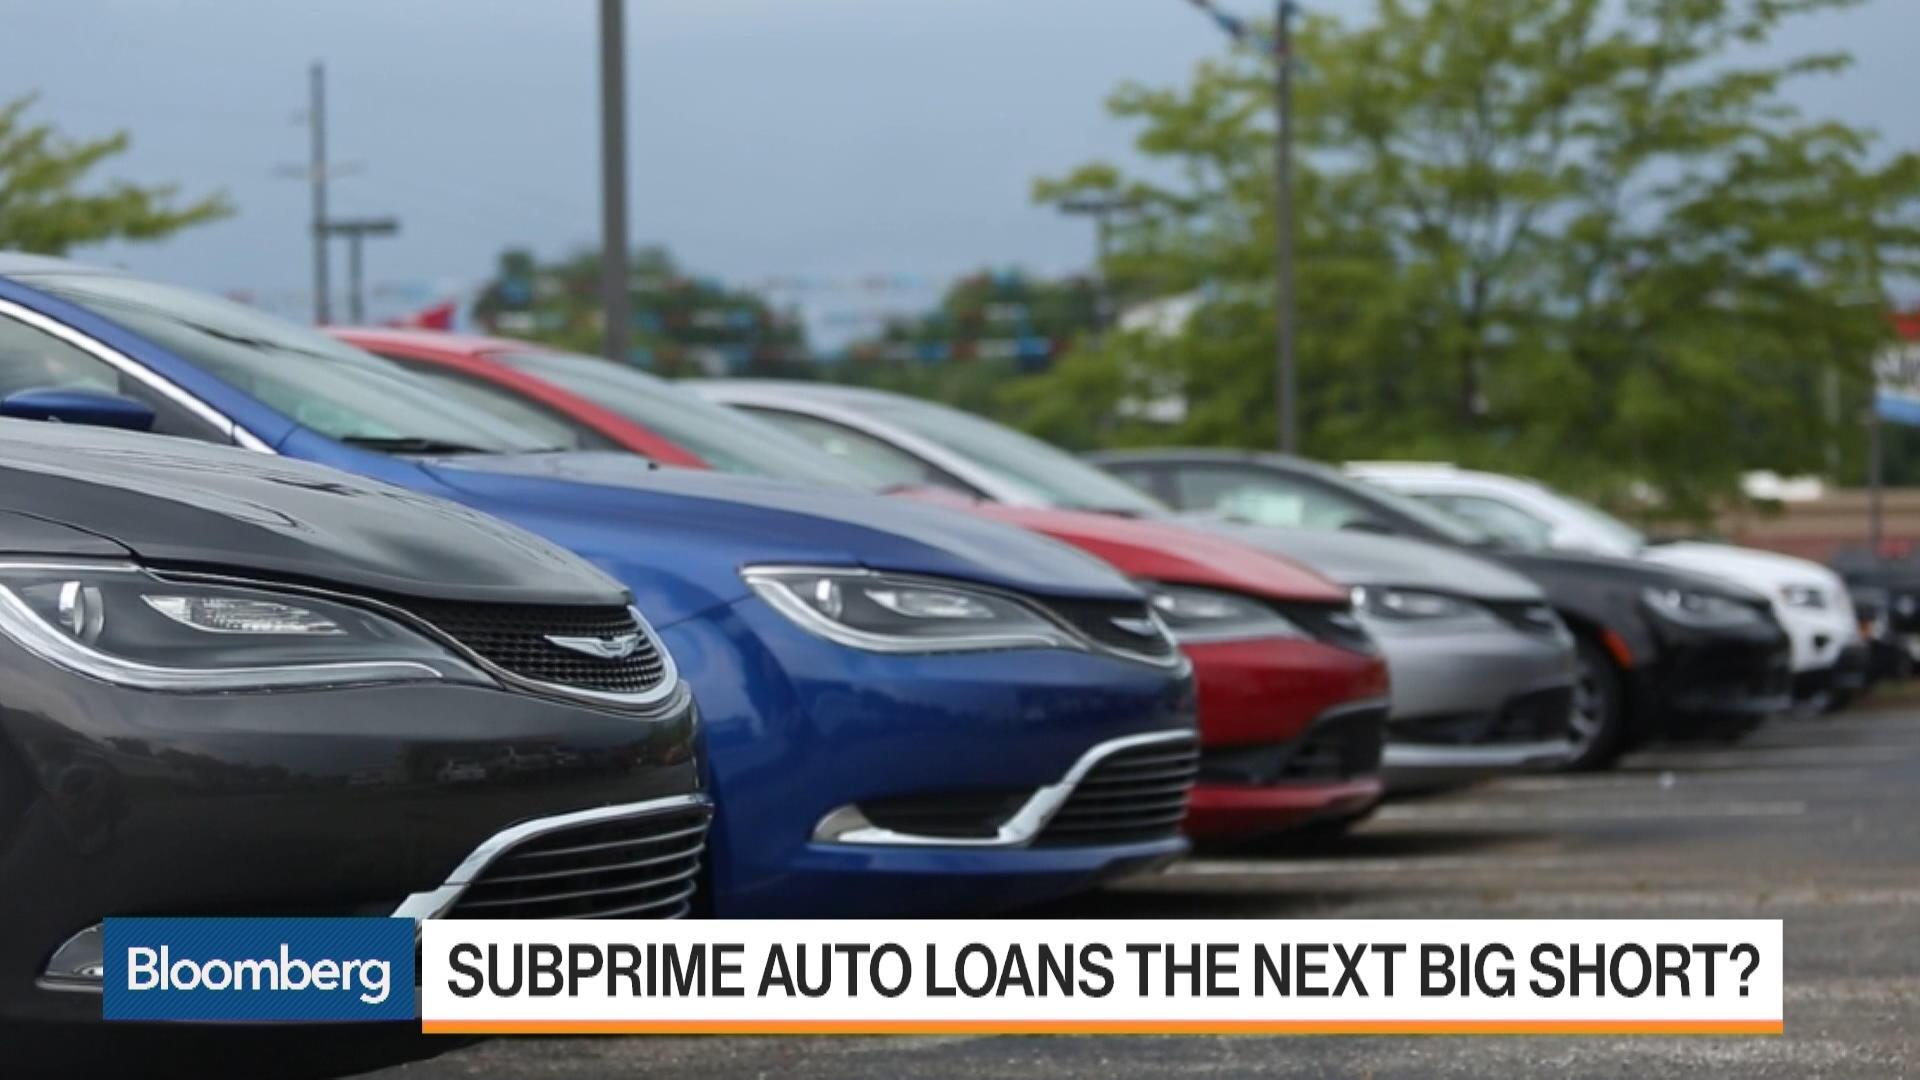 Permalink & Deepu0027 Subprime Car Loans Hit Crisis-Era Milestone - Bloomberg markmcfarlin.com